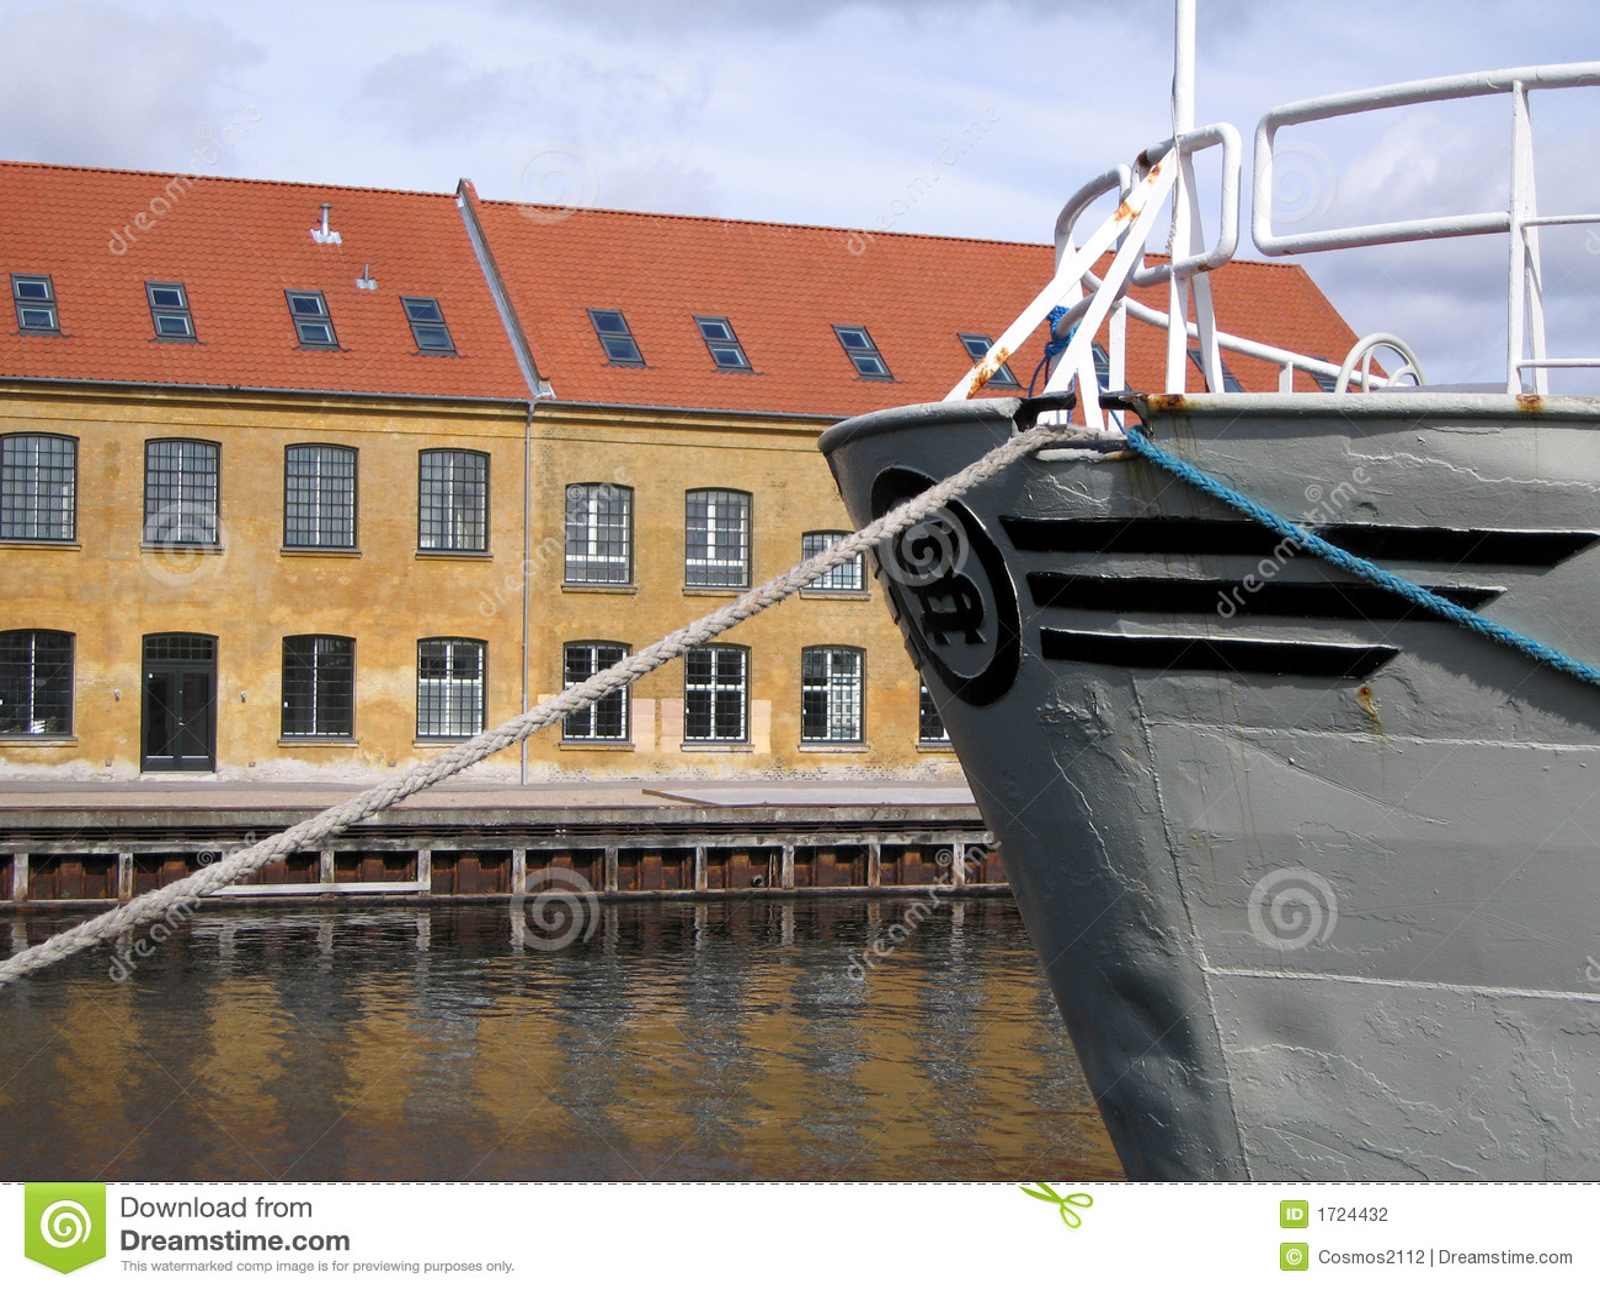 Docked Ship and Warehouse